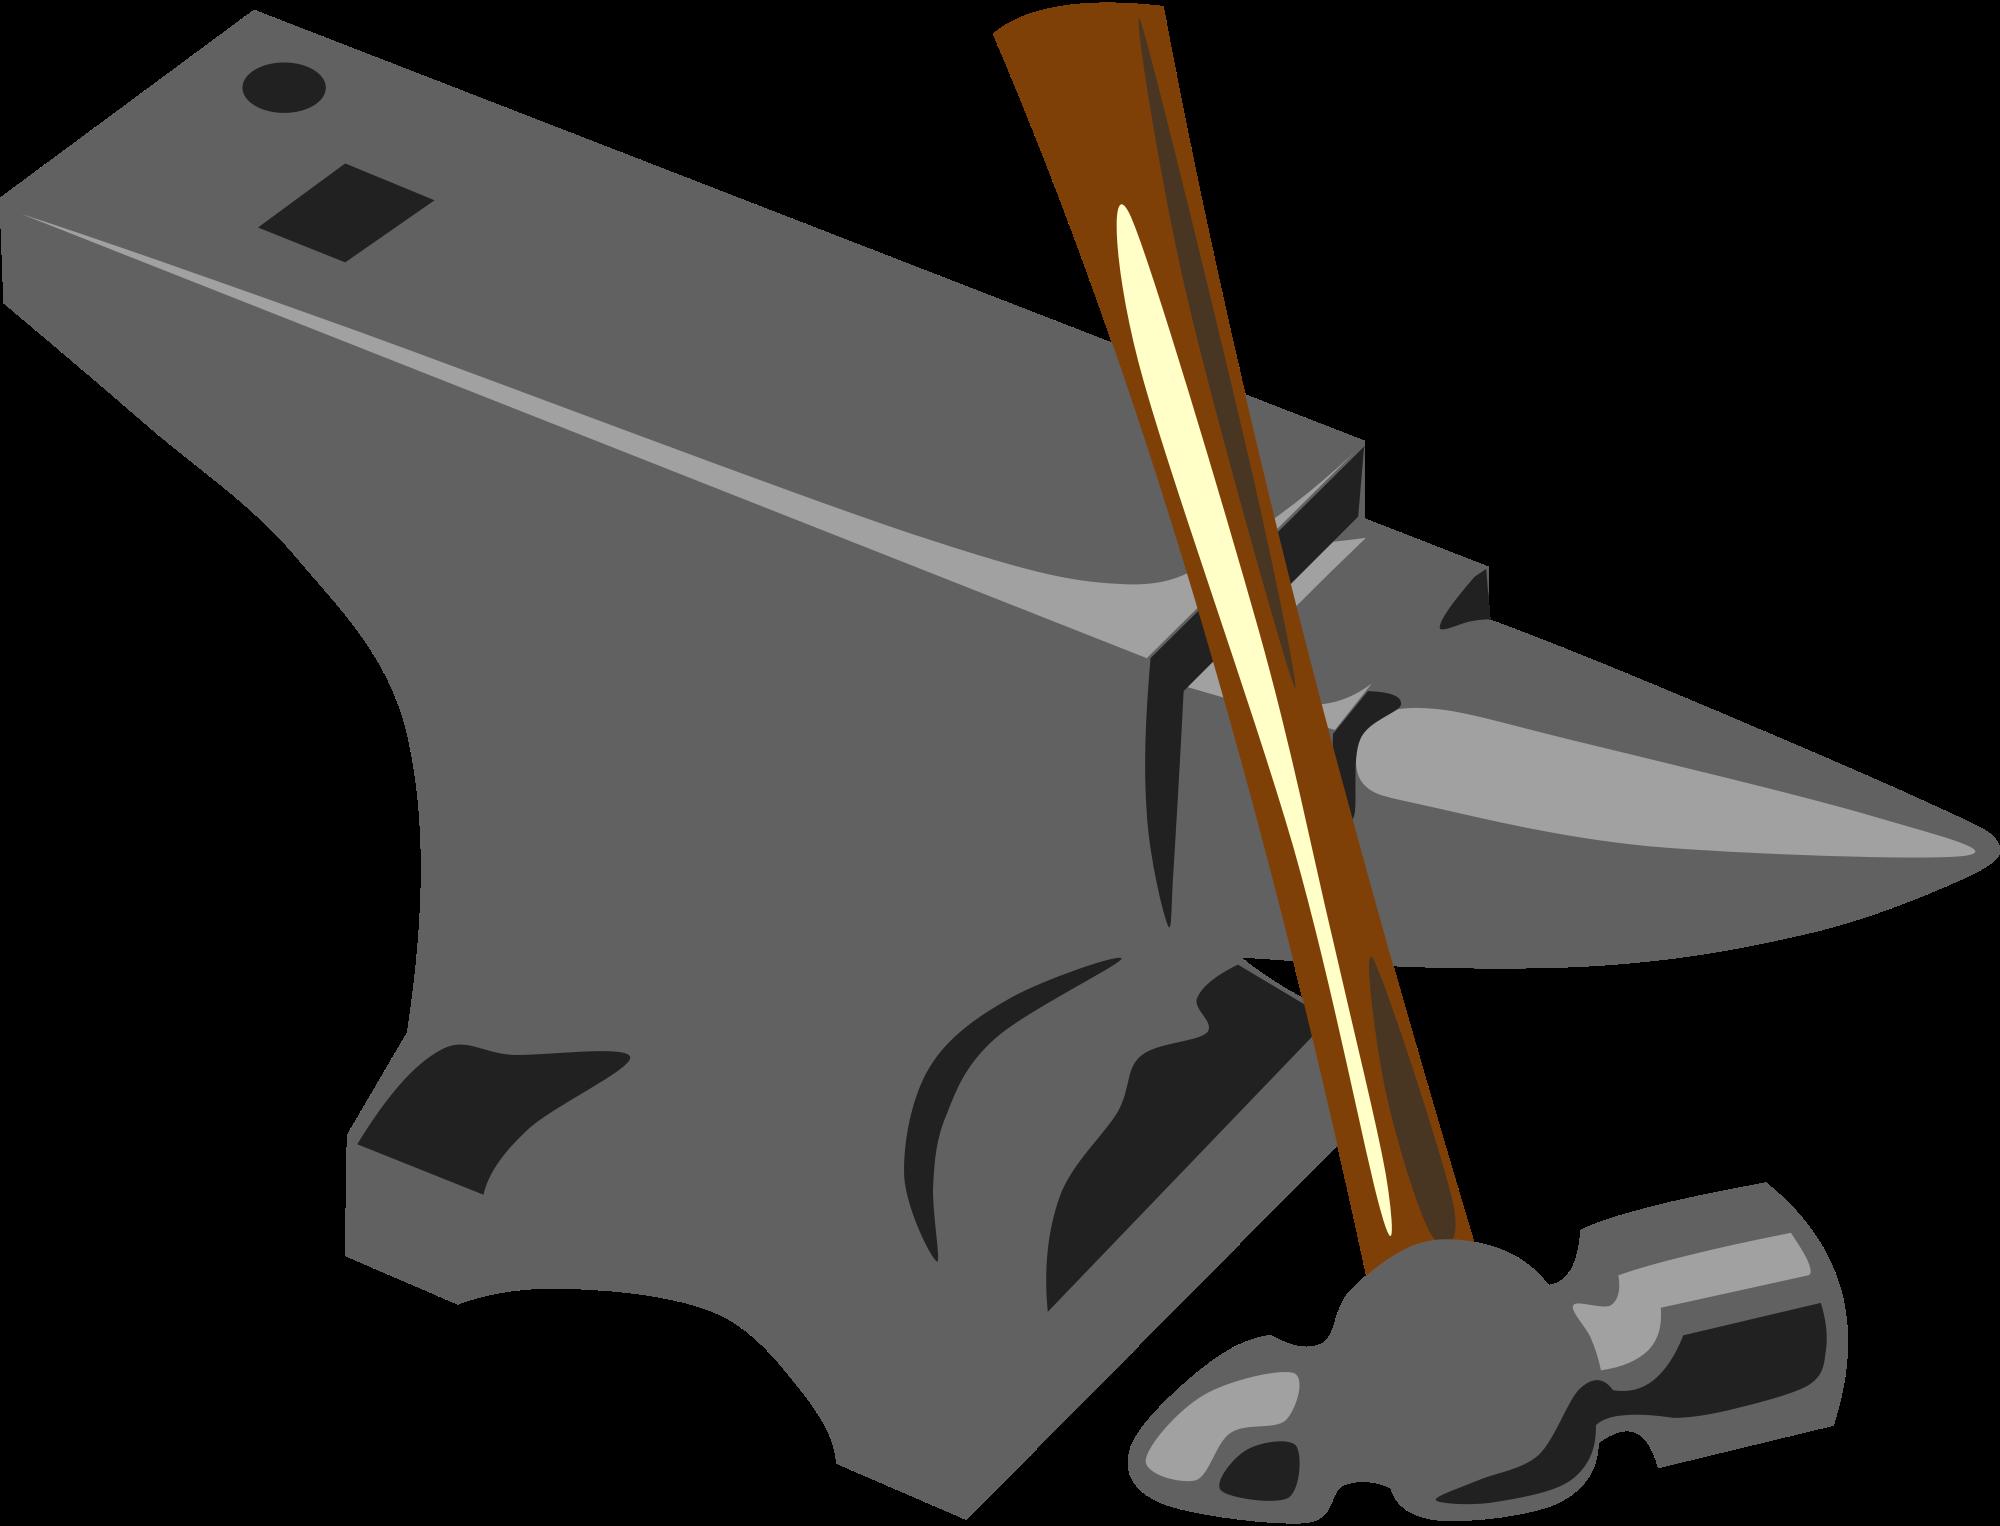 Blacksmith svg #20, Download drawings